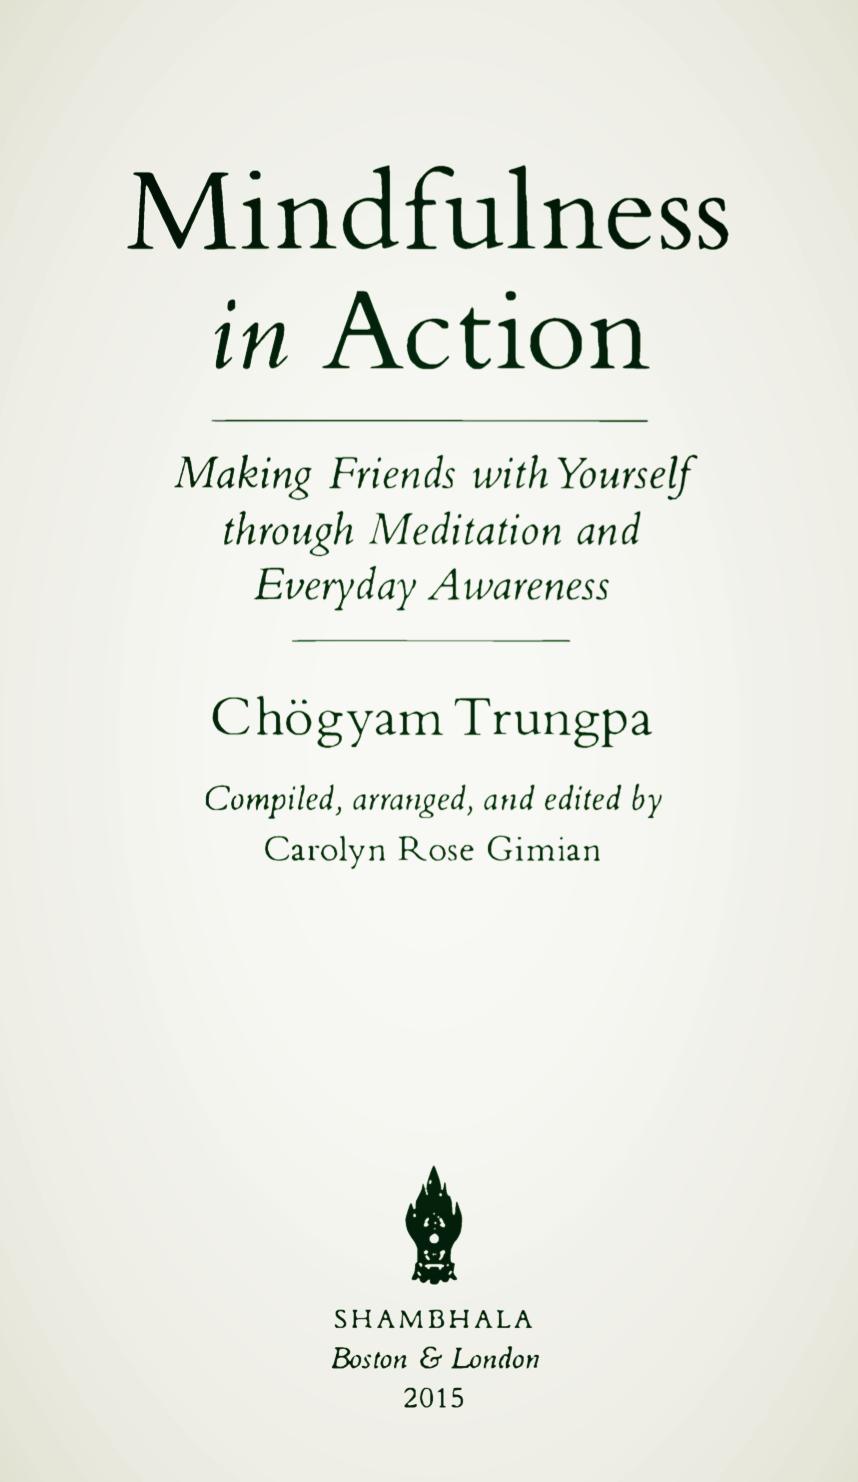 mindfulness-in-action-chogyam-trungpa